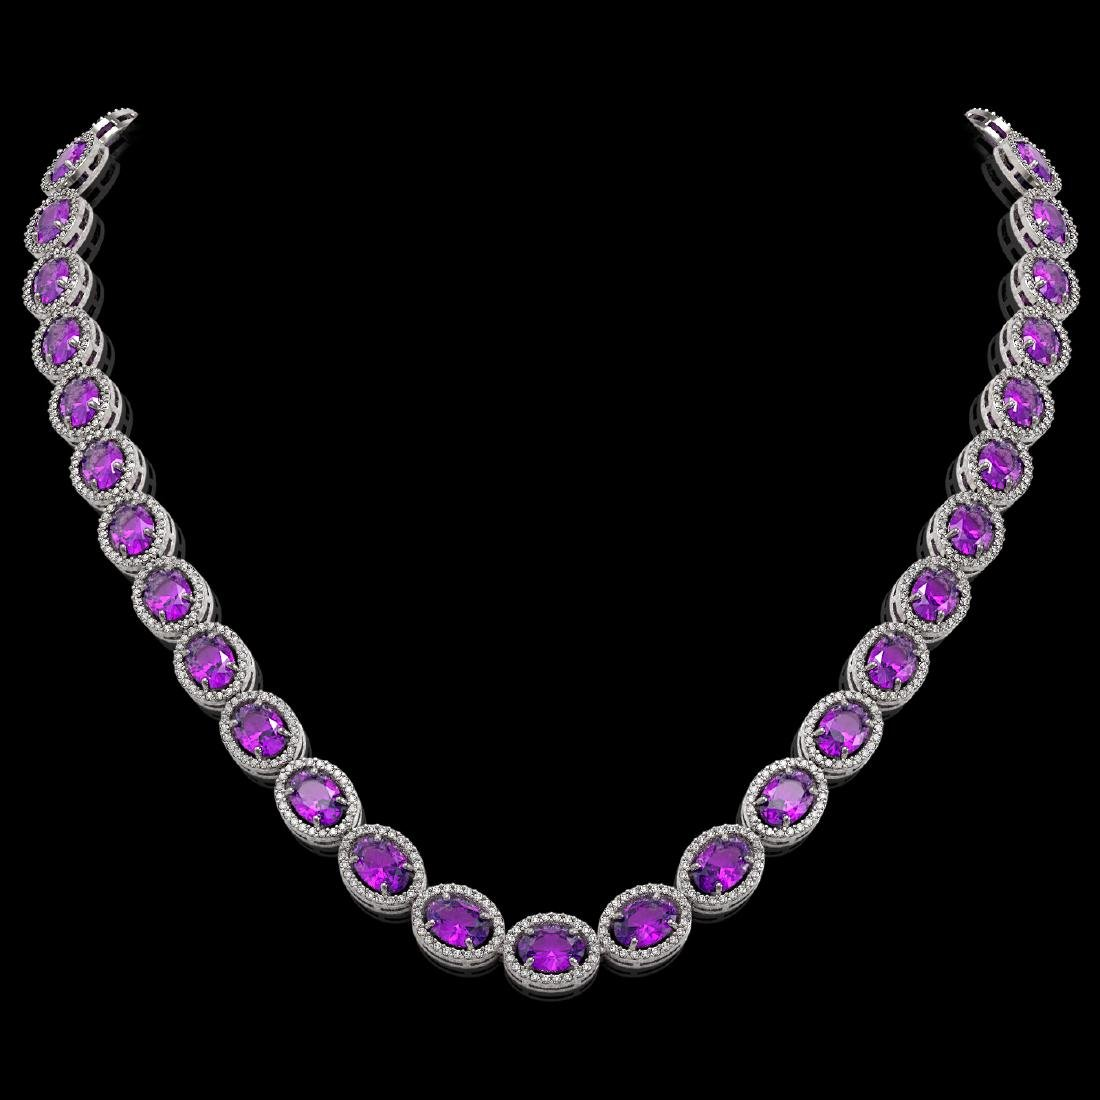 45.16 CTW Amethyst & Diamond Halo Necklace 10K White